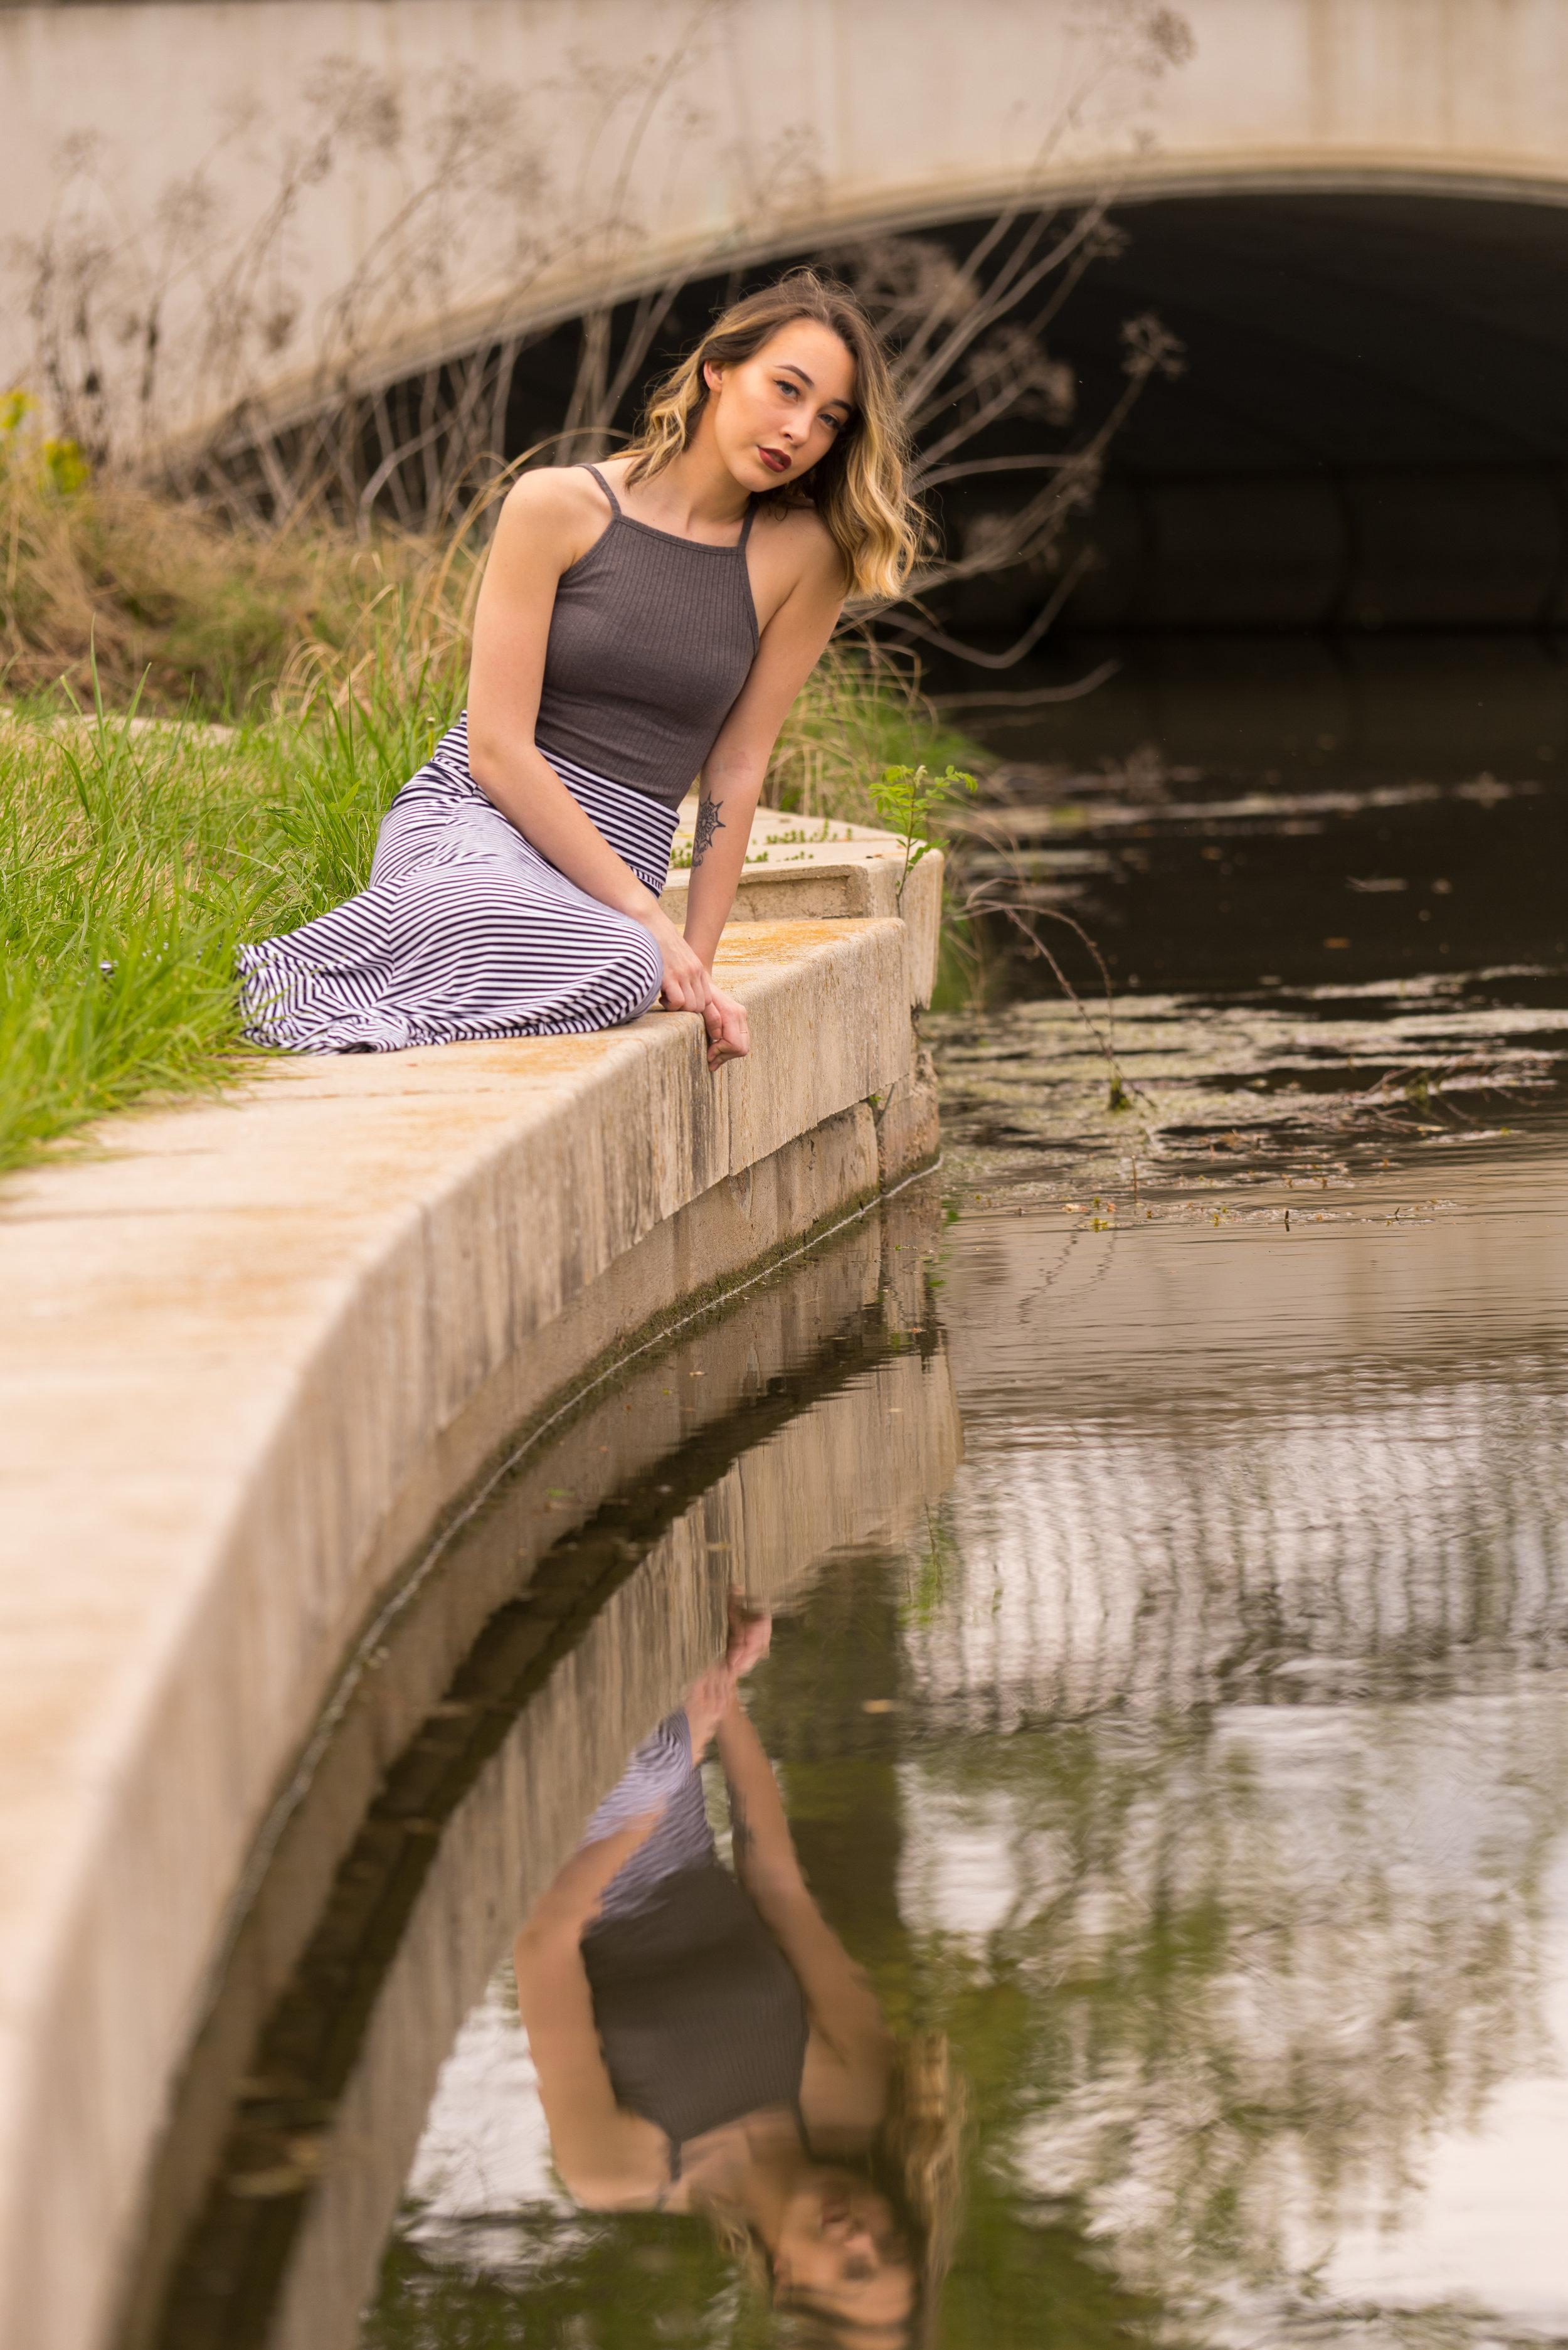 senior with lake reflection - Bay area portraits